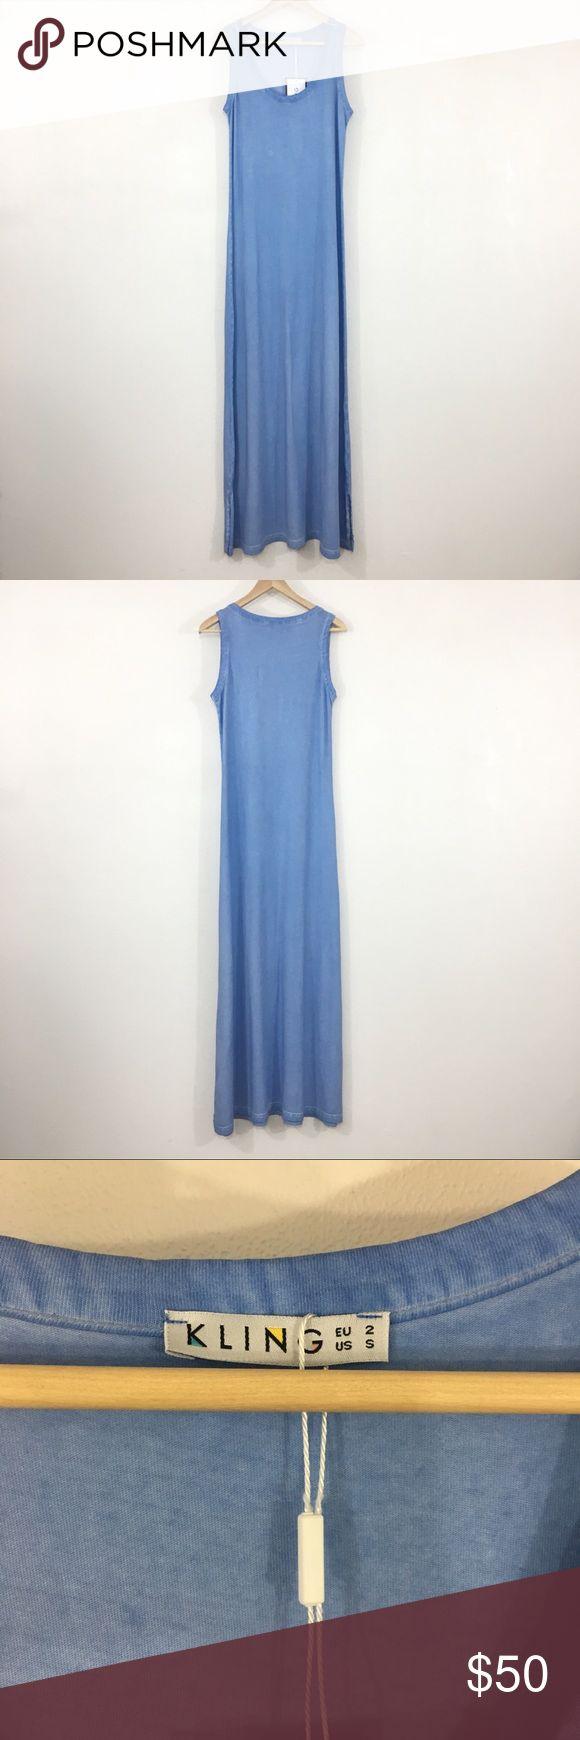 "🆕 Listing!  Kling | 'Nada' Organic Dress Sky blue organic cotton extra long maxi dress.  Tank top style.  Love!!  Measurements  Armpit to armpit: 17"" Waist: 32"" Length: 58"" Kling Dresses Maxi"